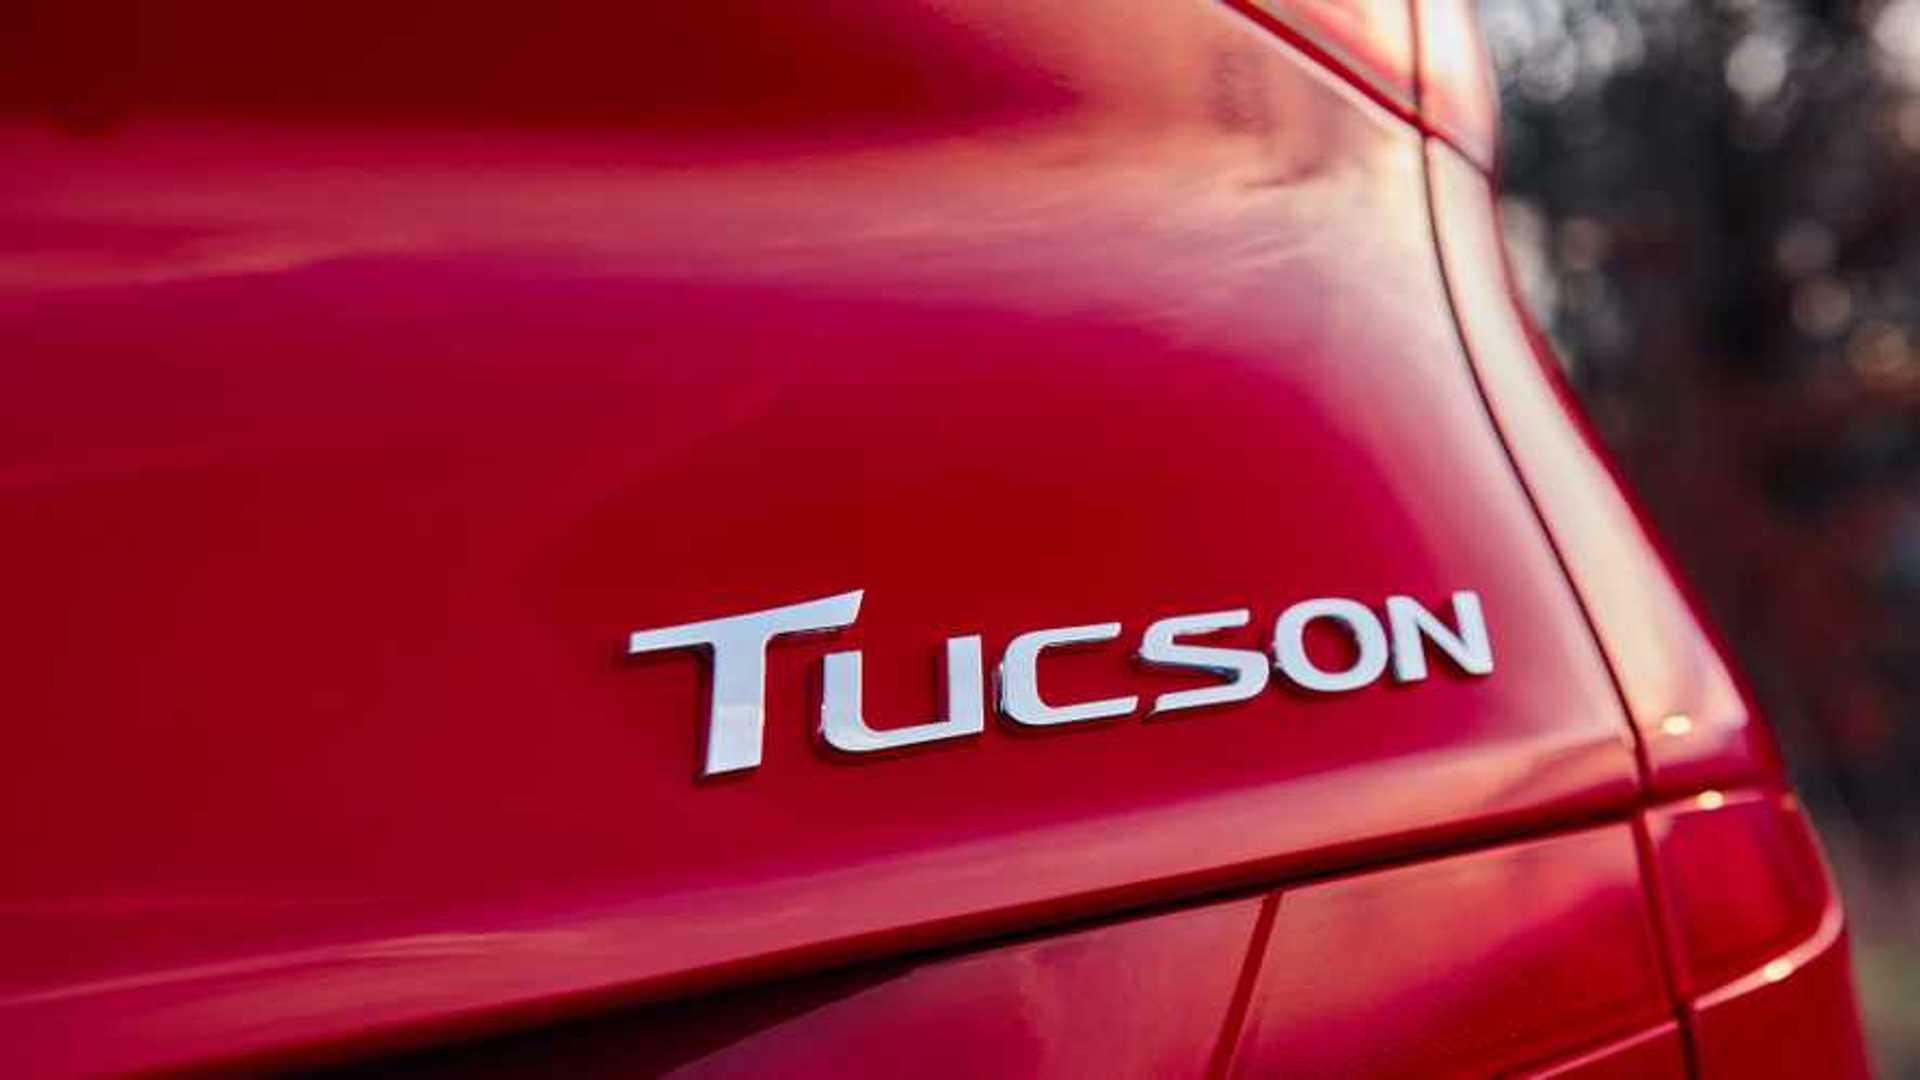 Next Hyundai Tucson Will Make You 'Freak Out,' Designer Claims